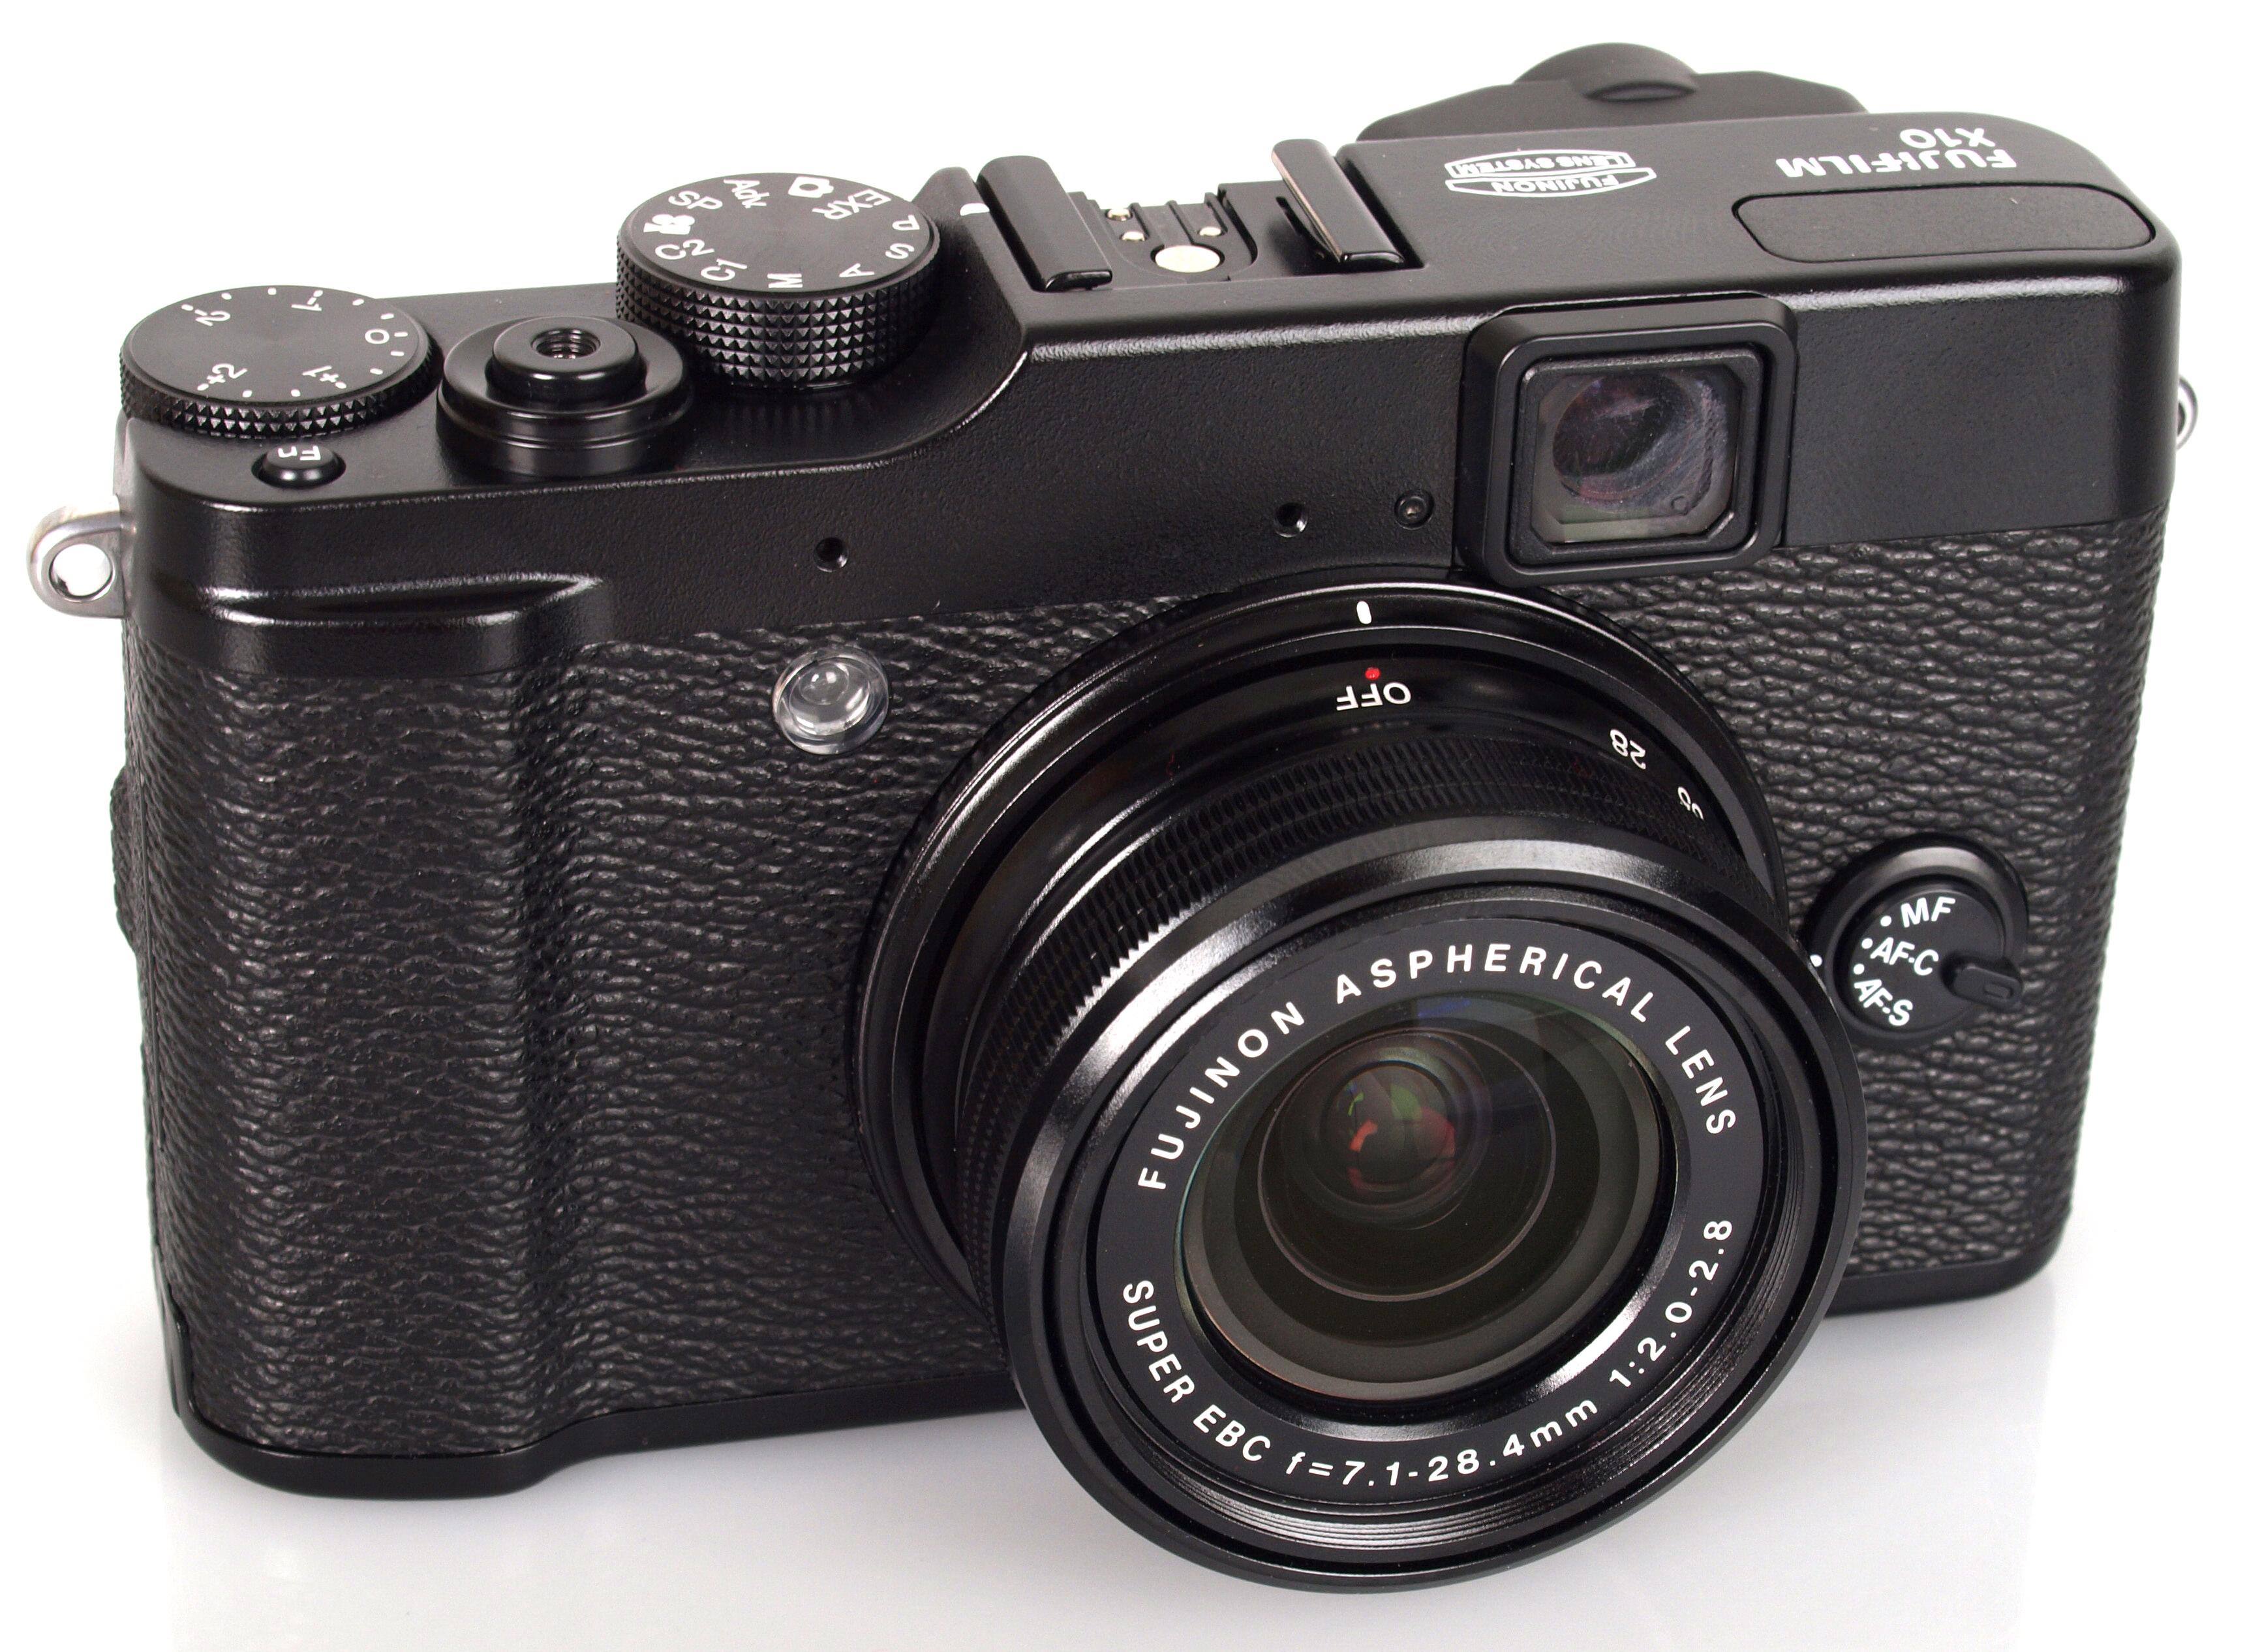 fujifilm finepix x10 serious compact review rh ephotozine com fujifilm x10 camera manual fujifilm x10 camera manual